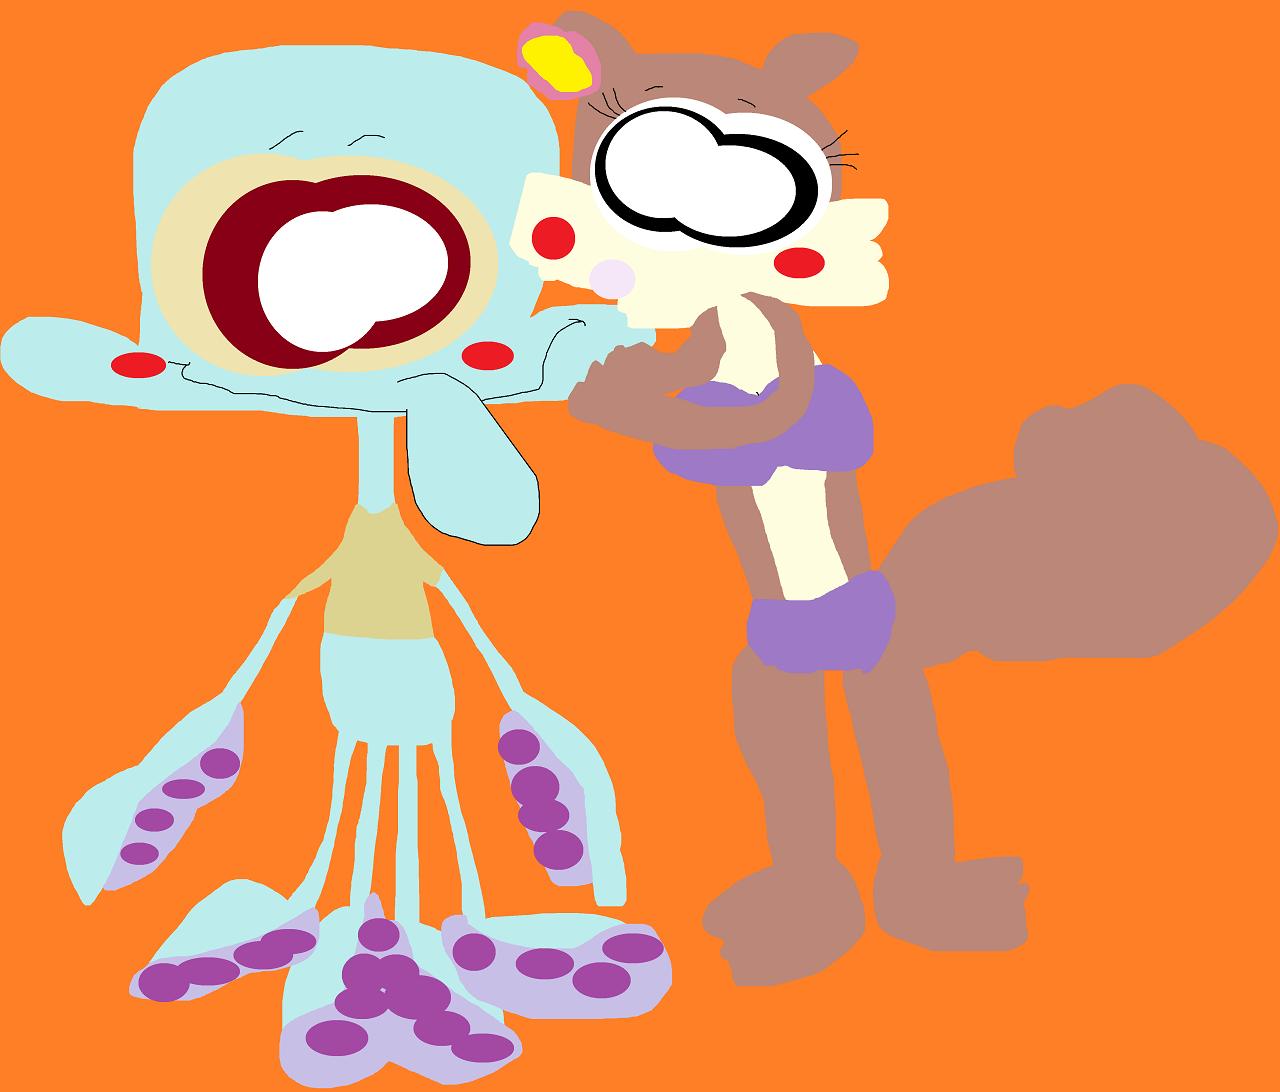 Sandy Kissing A Nervous Squidward's Cheek Again by Falconlobo